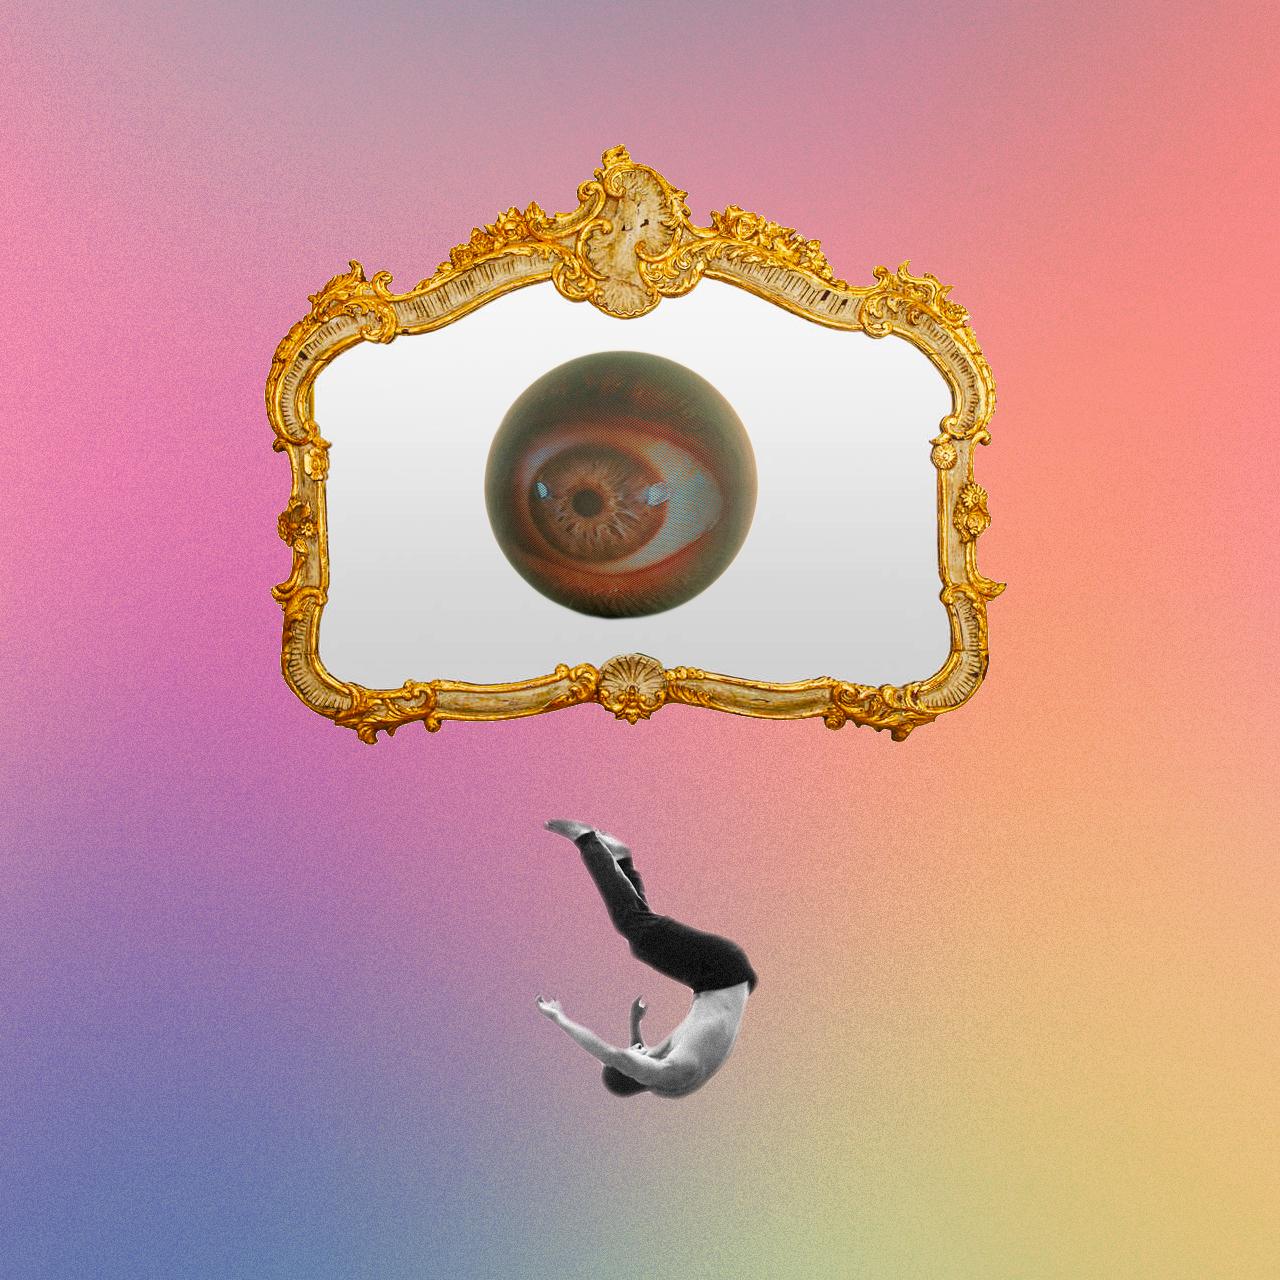 Digital Dream Realm [collage, 2016]